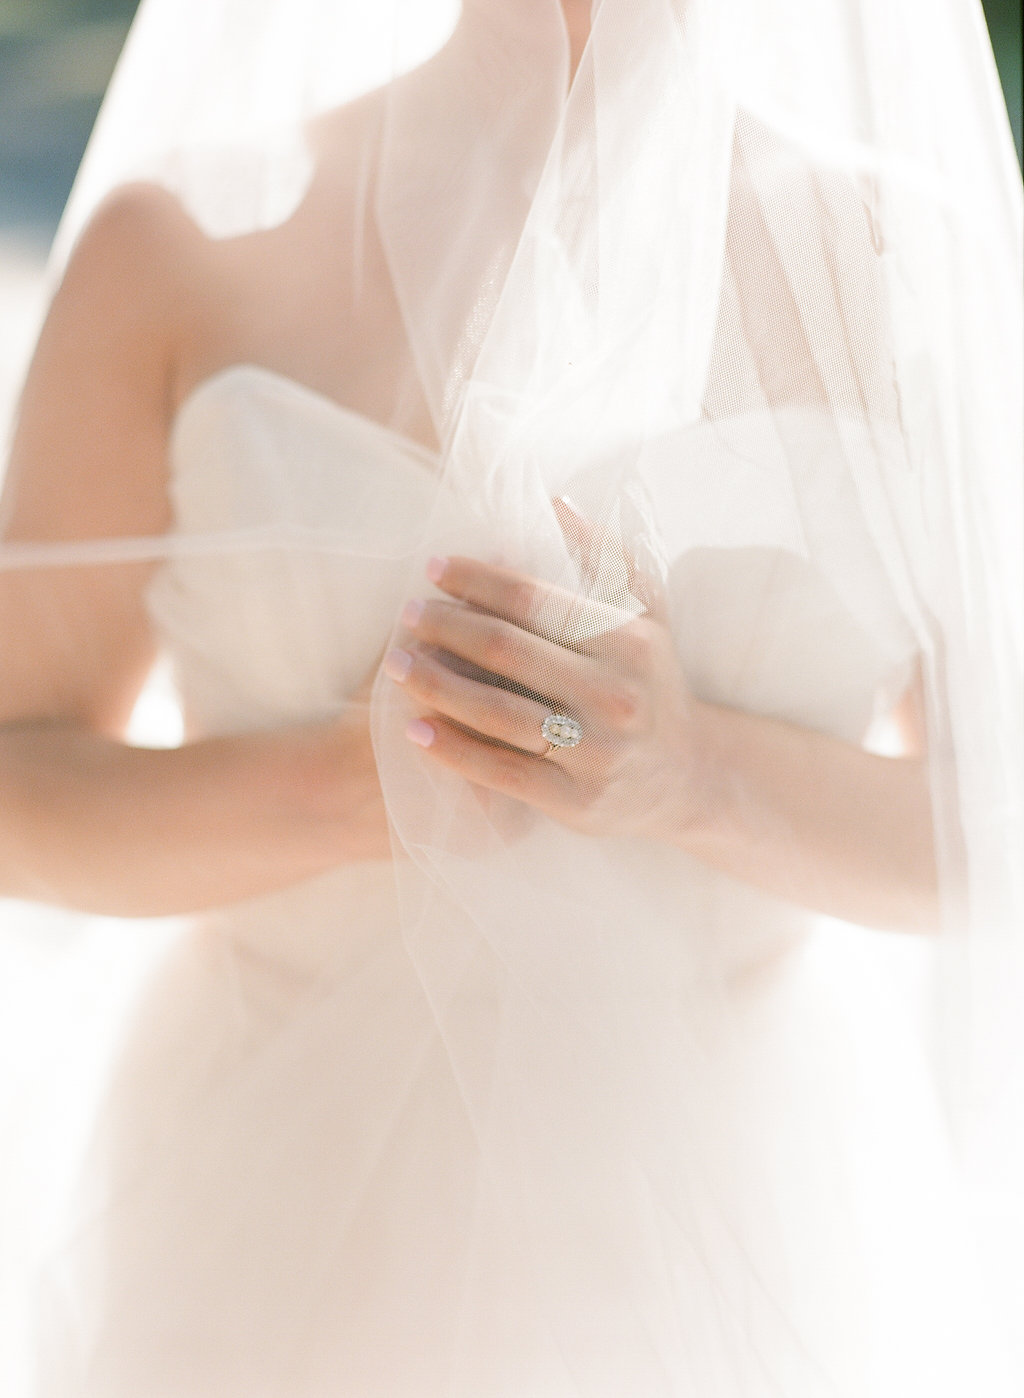 the-happy-bloom-wormsloe-wedding-savannah-wedding-ivory-and-beau-bridal-boutique-savannah-wedding-dresses-savannah-bridal-boutique-georgia-bridal-boutique-design-studio-south-sunset-wedding-blush-by-hayley-paige-candi-1550-blush-wedding-dress-14.jpg